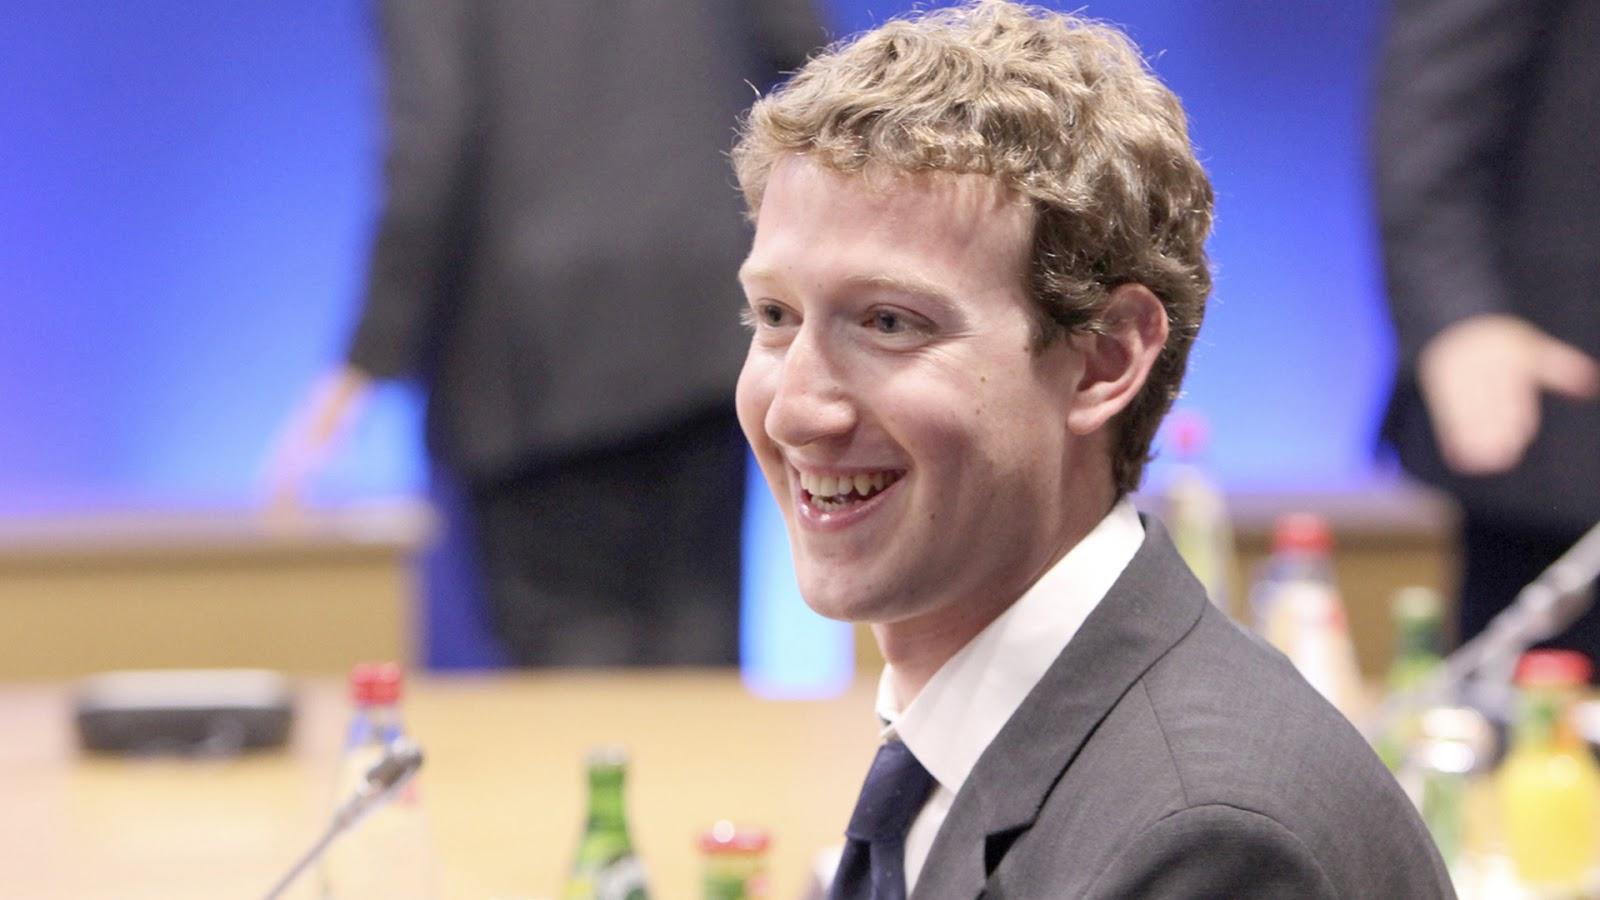 download image mark zuckerberg - photo #20